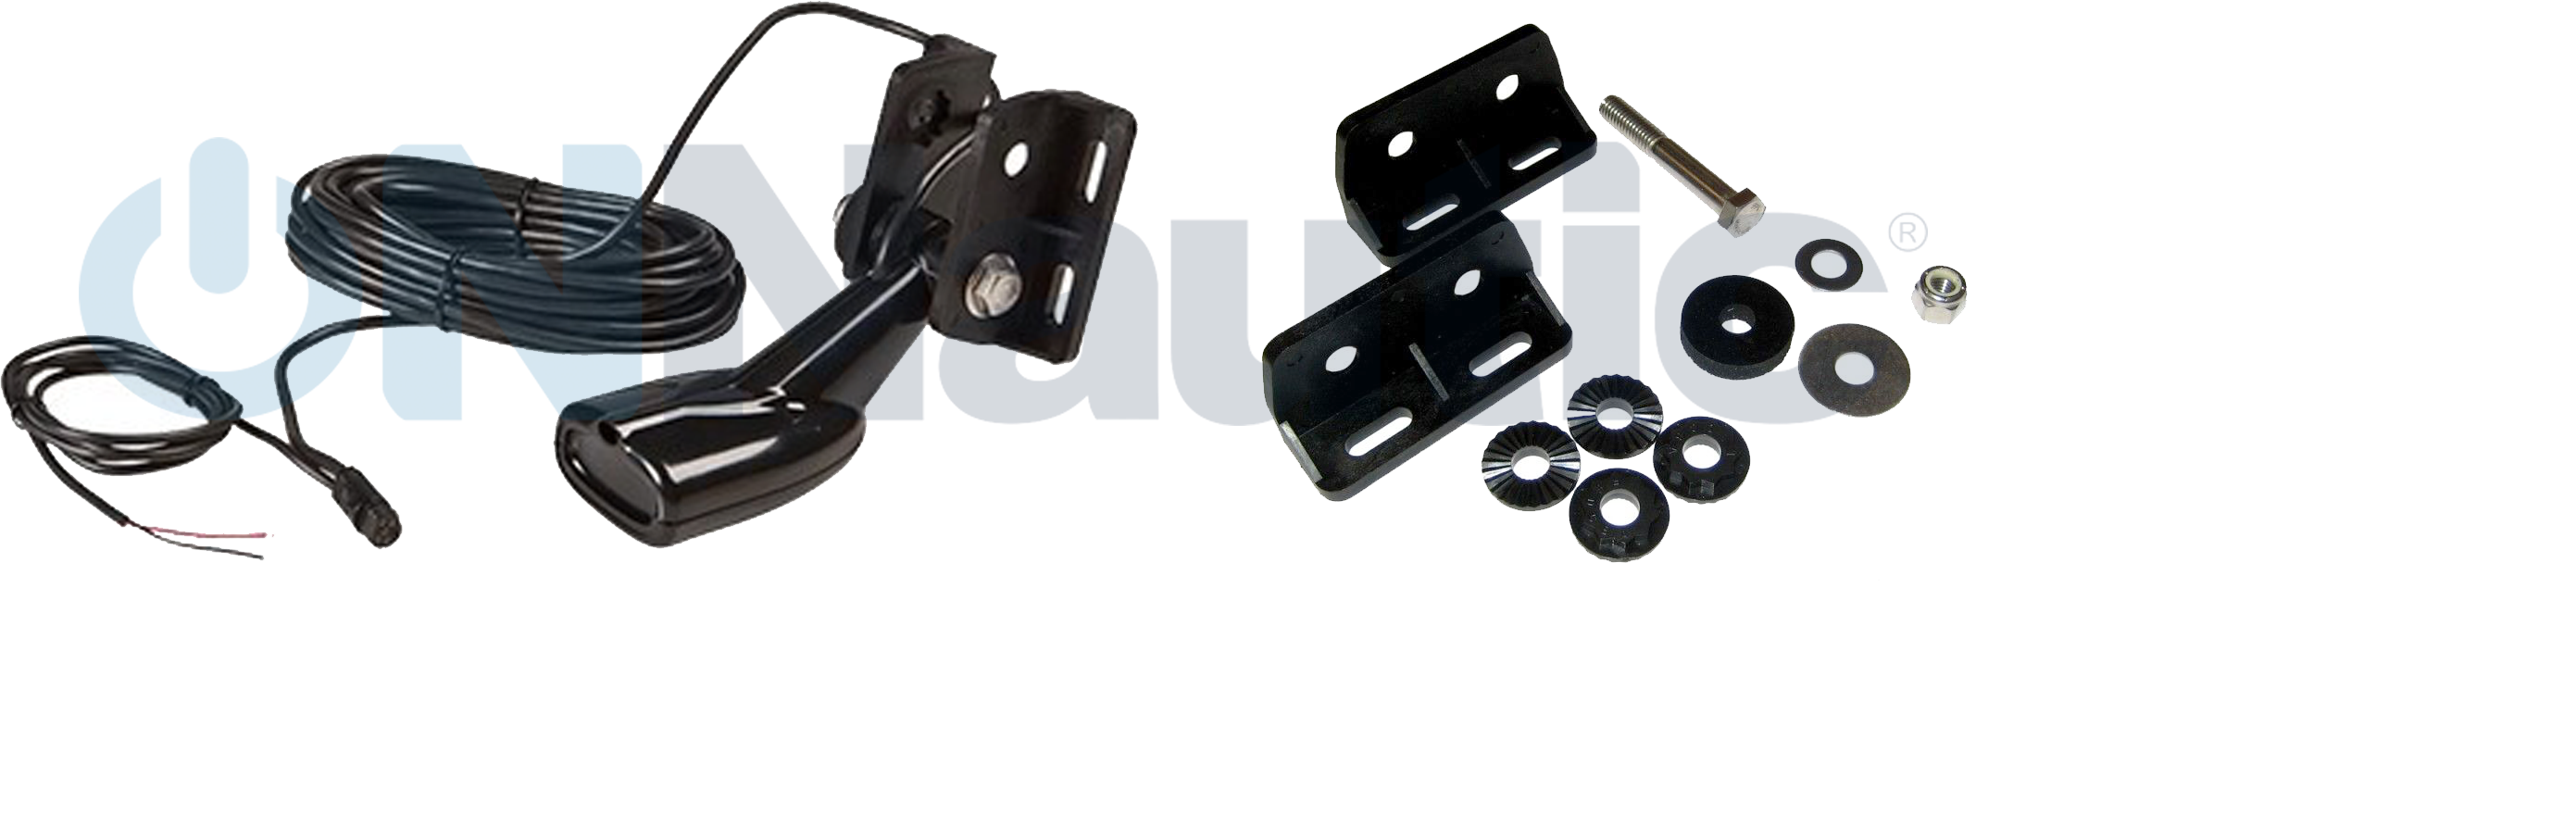 Transductor uniplug 50-200 WS